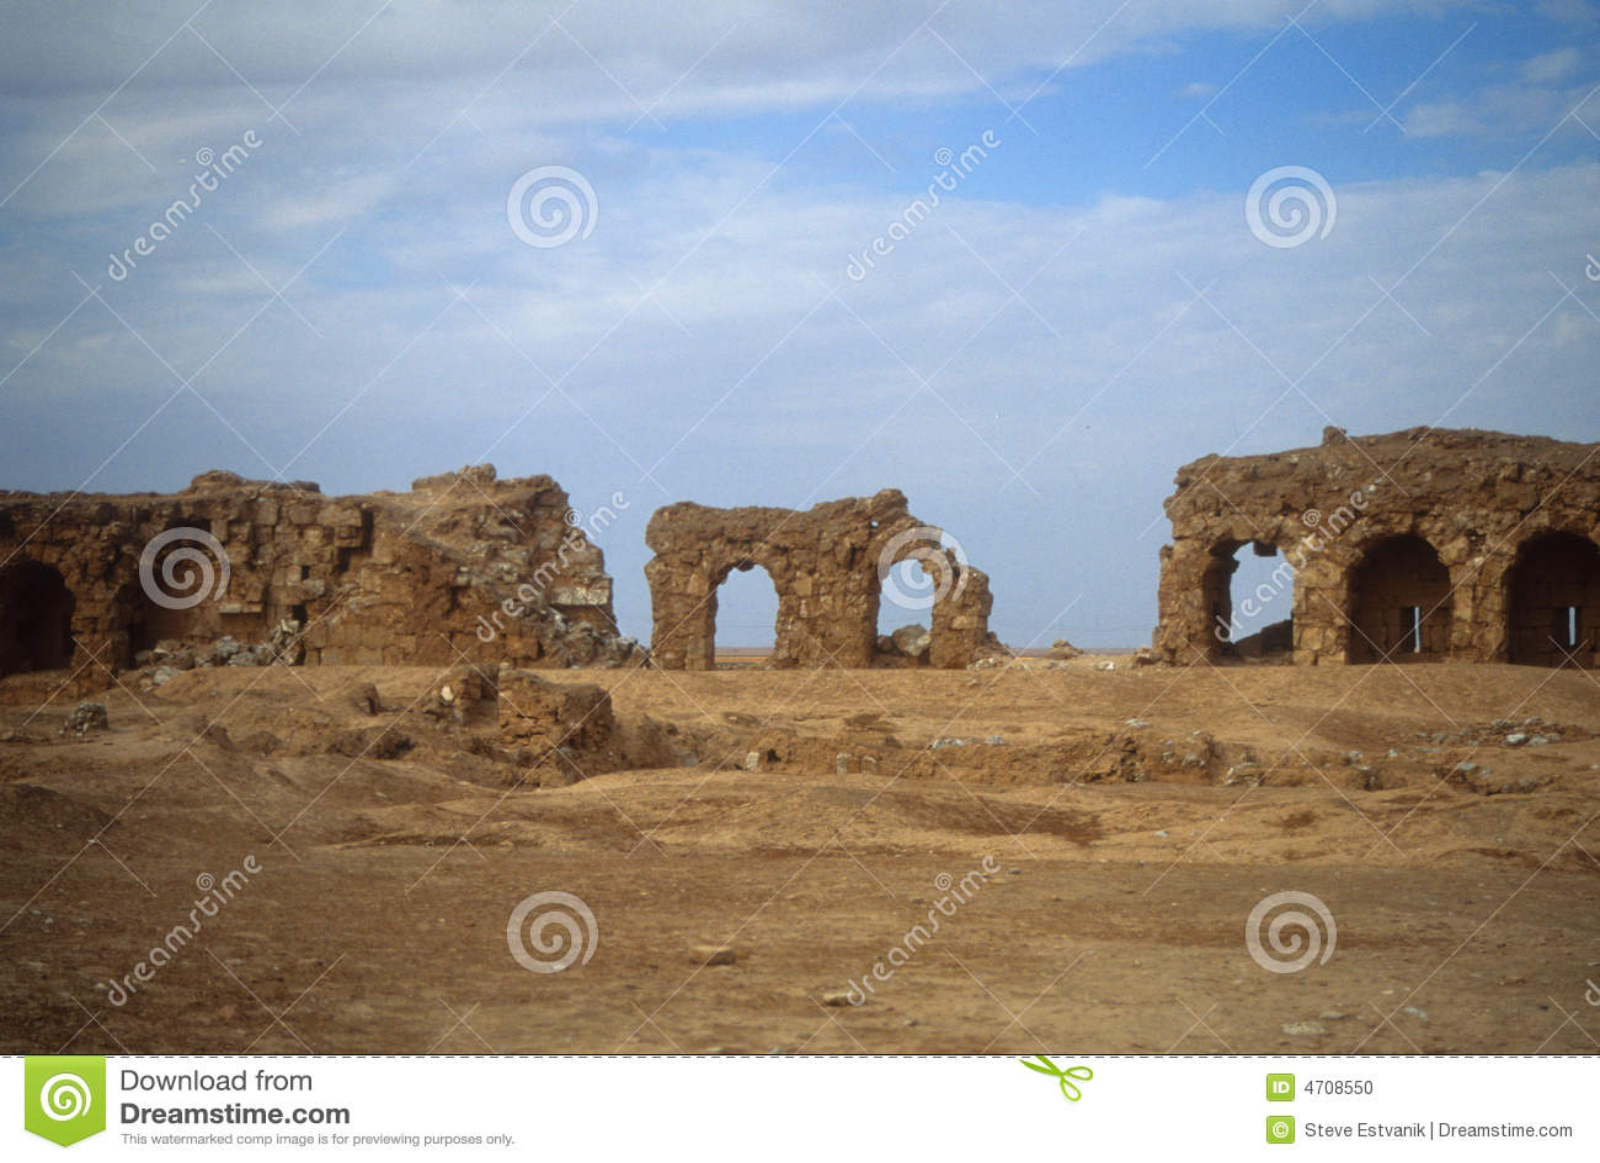 Ruins of city walls